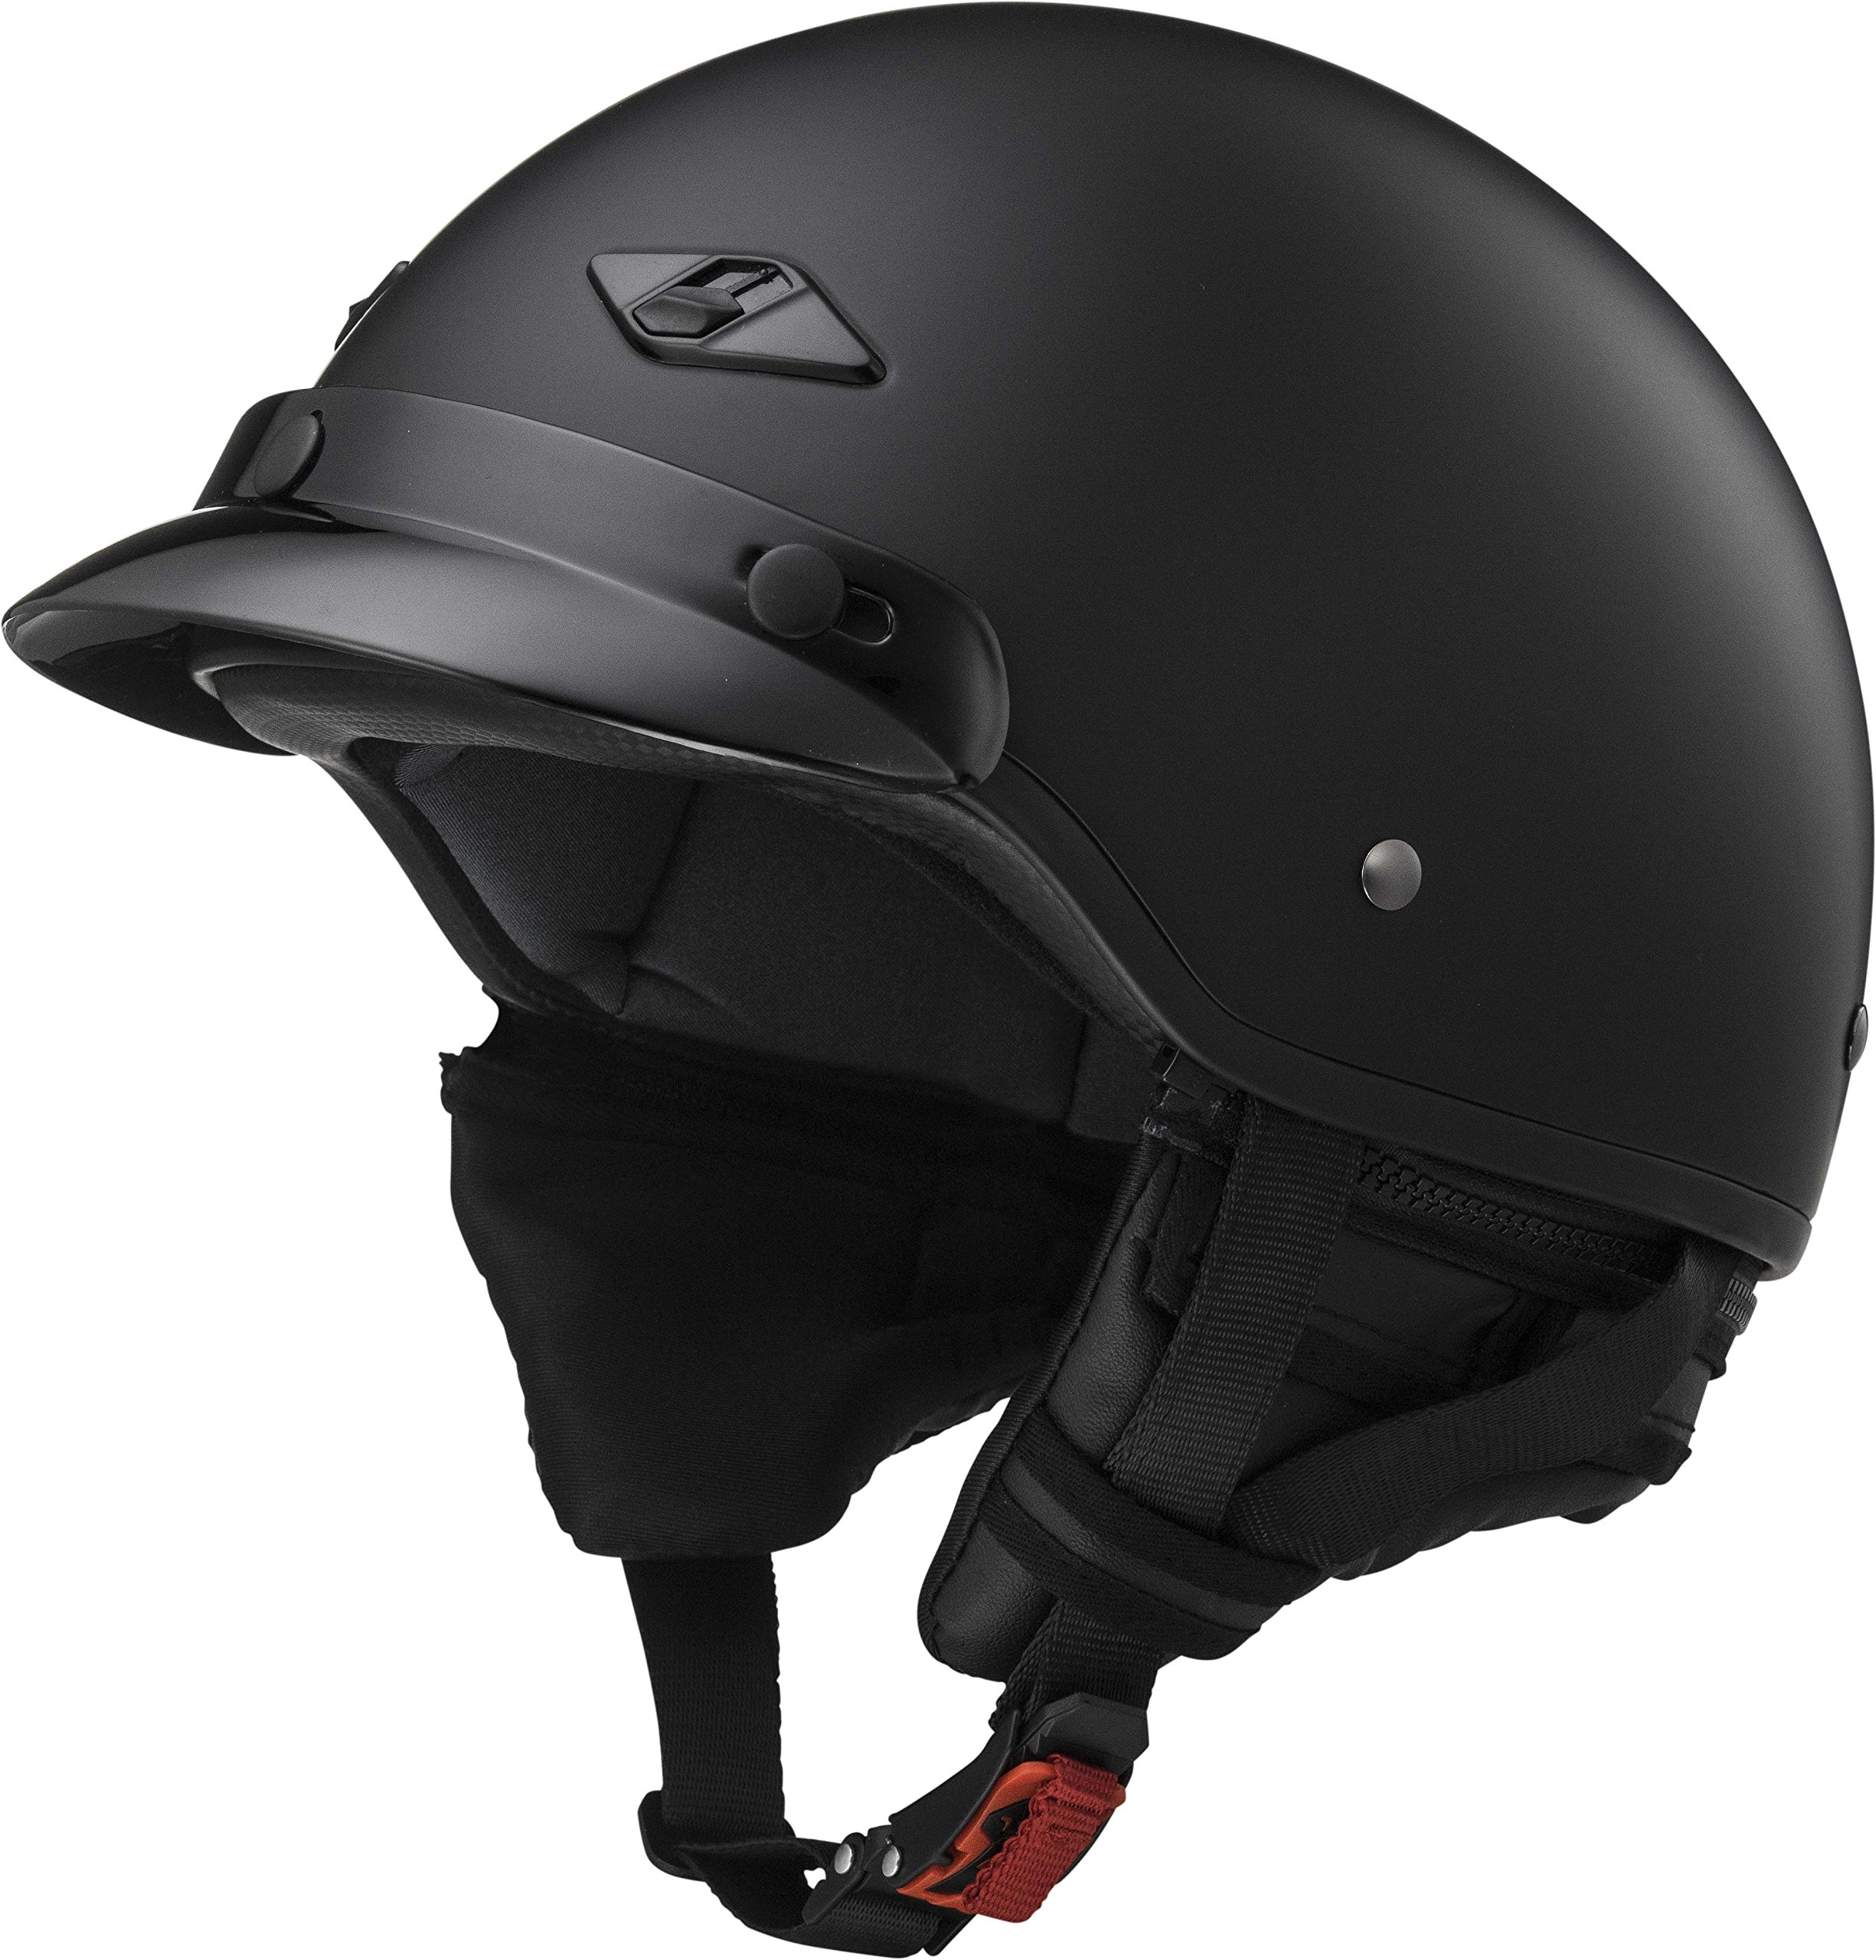 LS2 Helmets Unisex-Adult Half-Size-Helmet-Style Bagger Helmet (Matt Black, Small) by LS2 Helmets